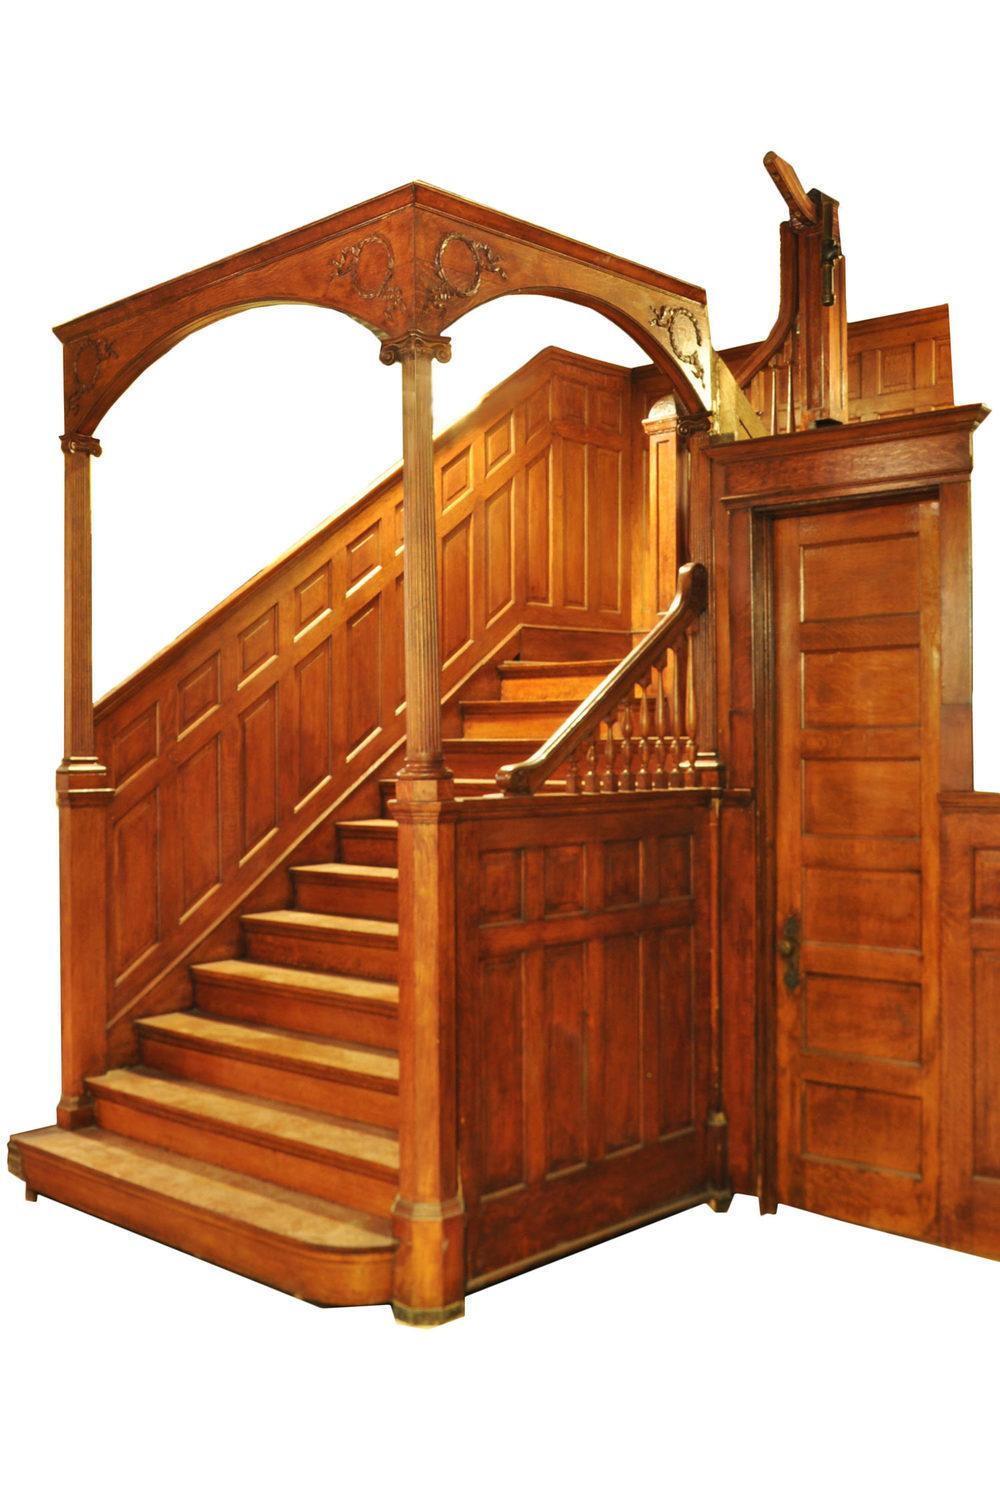 44961-staircase-side.jpg